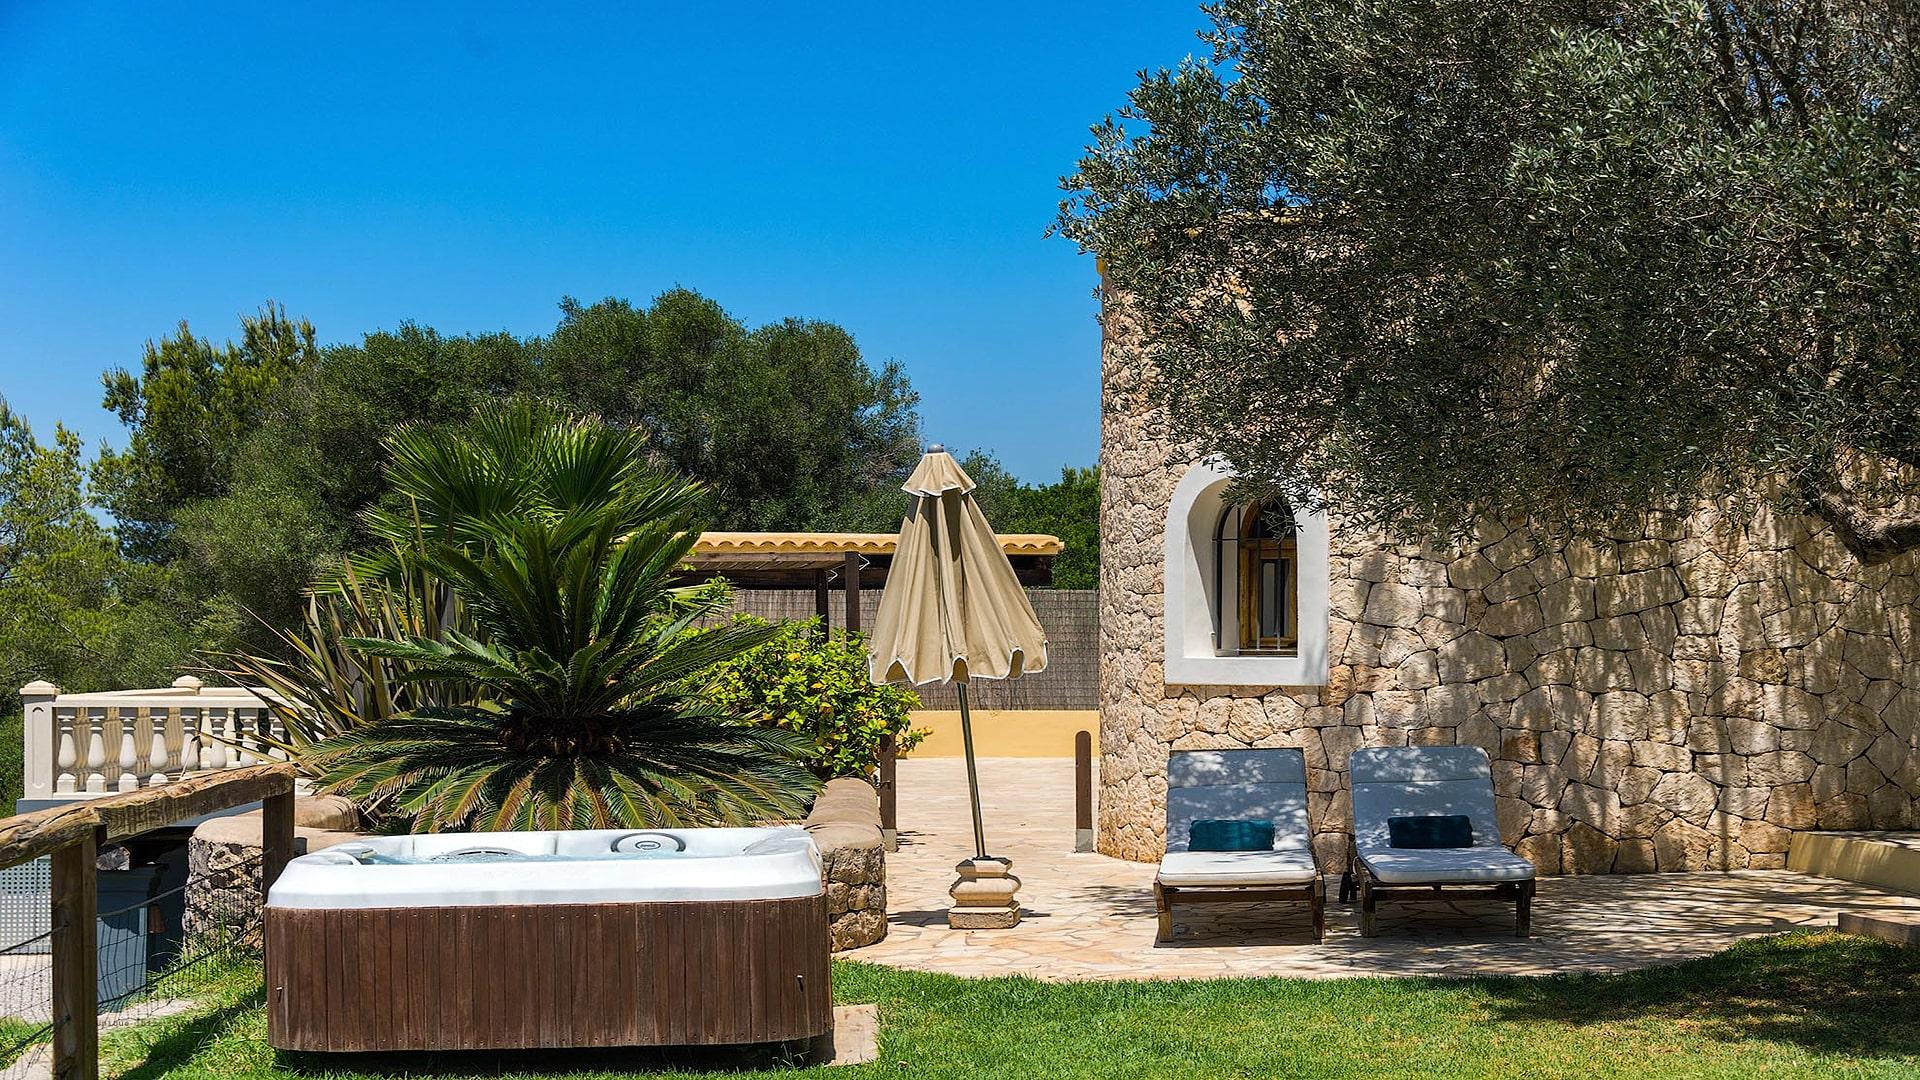 Casa Beni Ibiza 12 Santa Eulalia